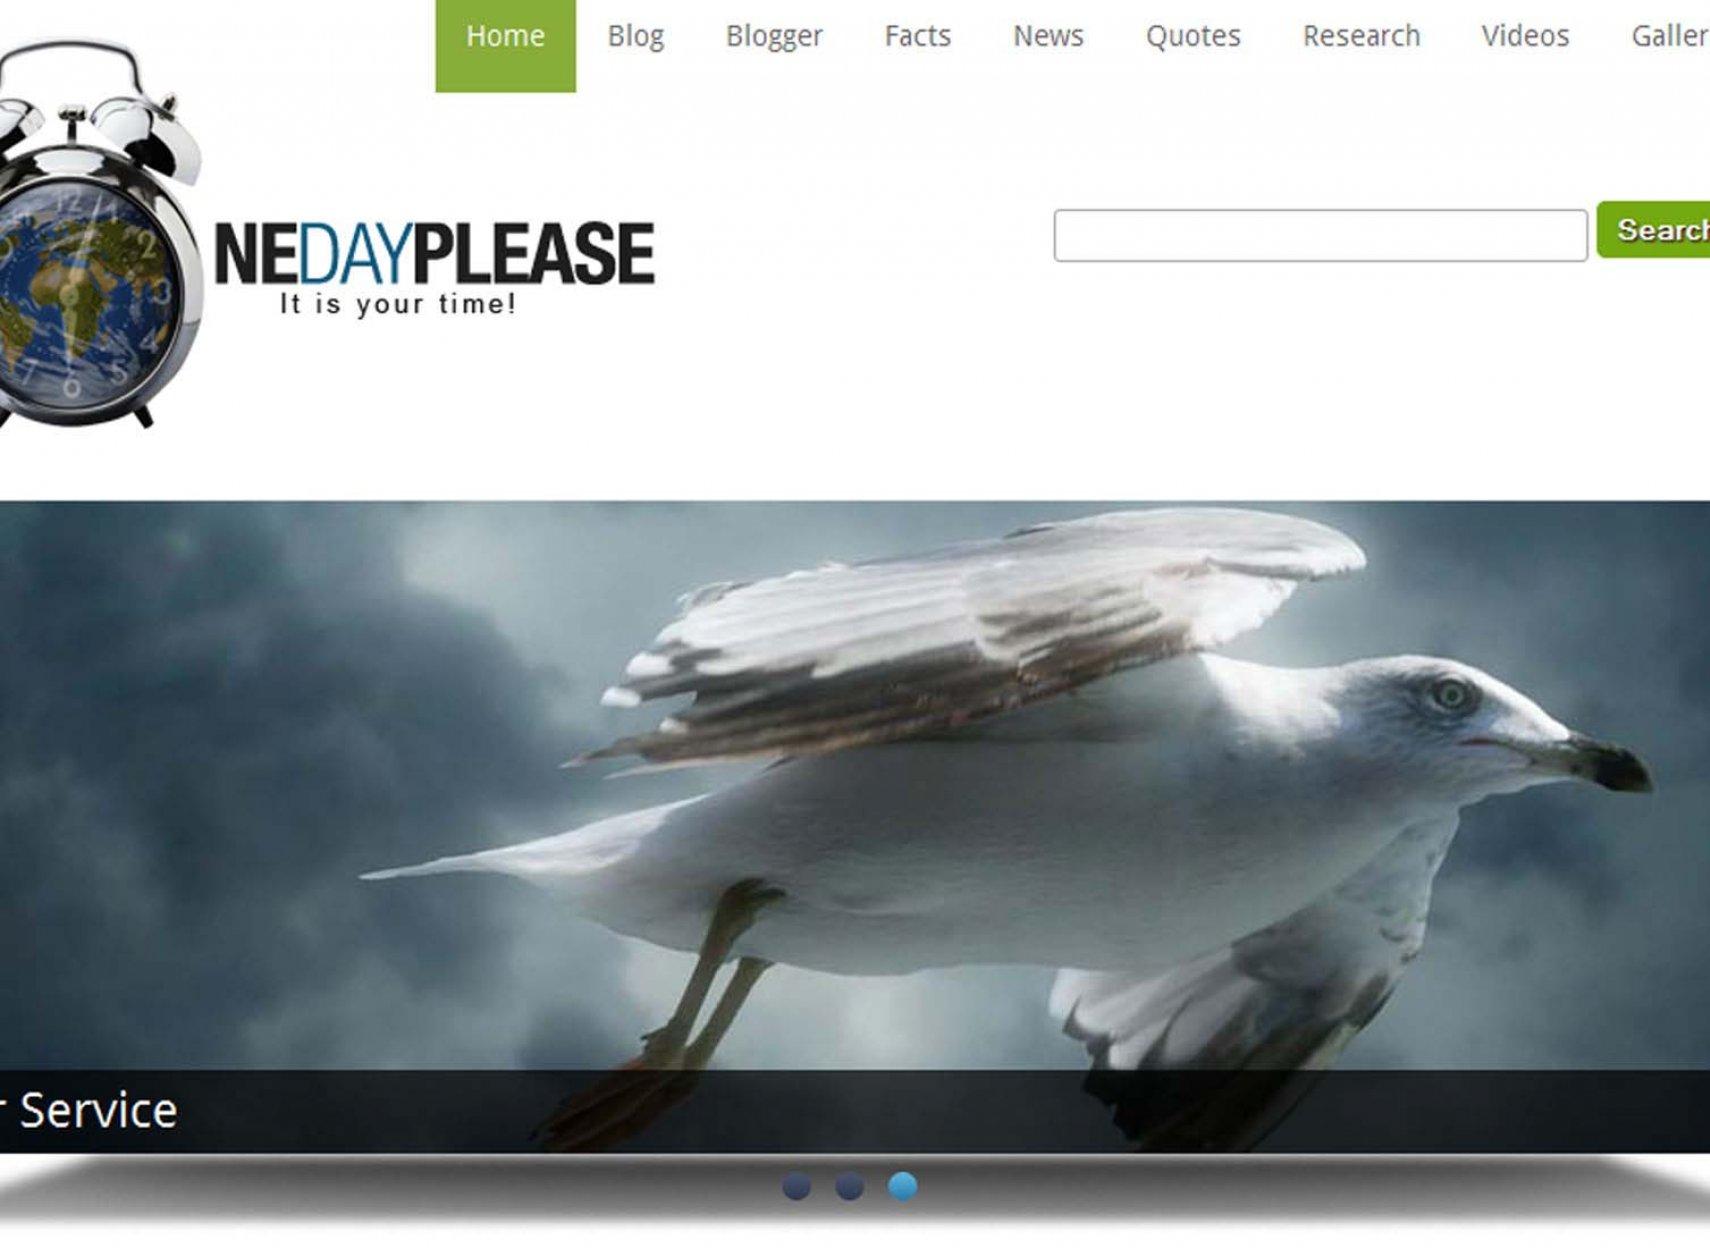 www.onedayplease.org